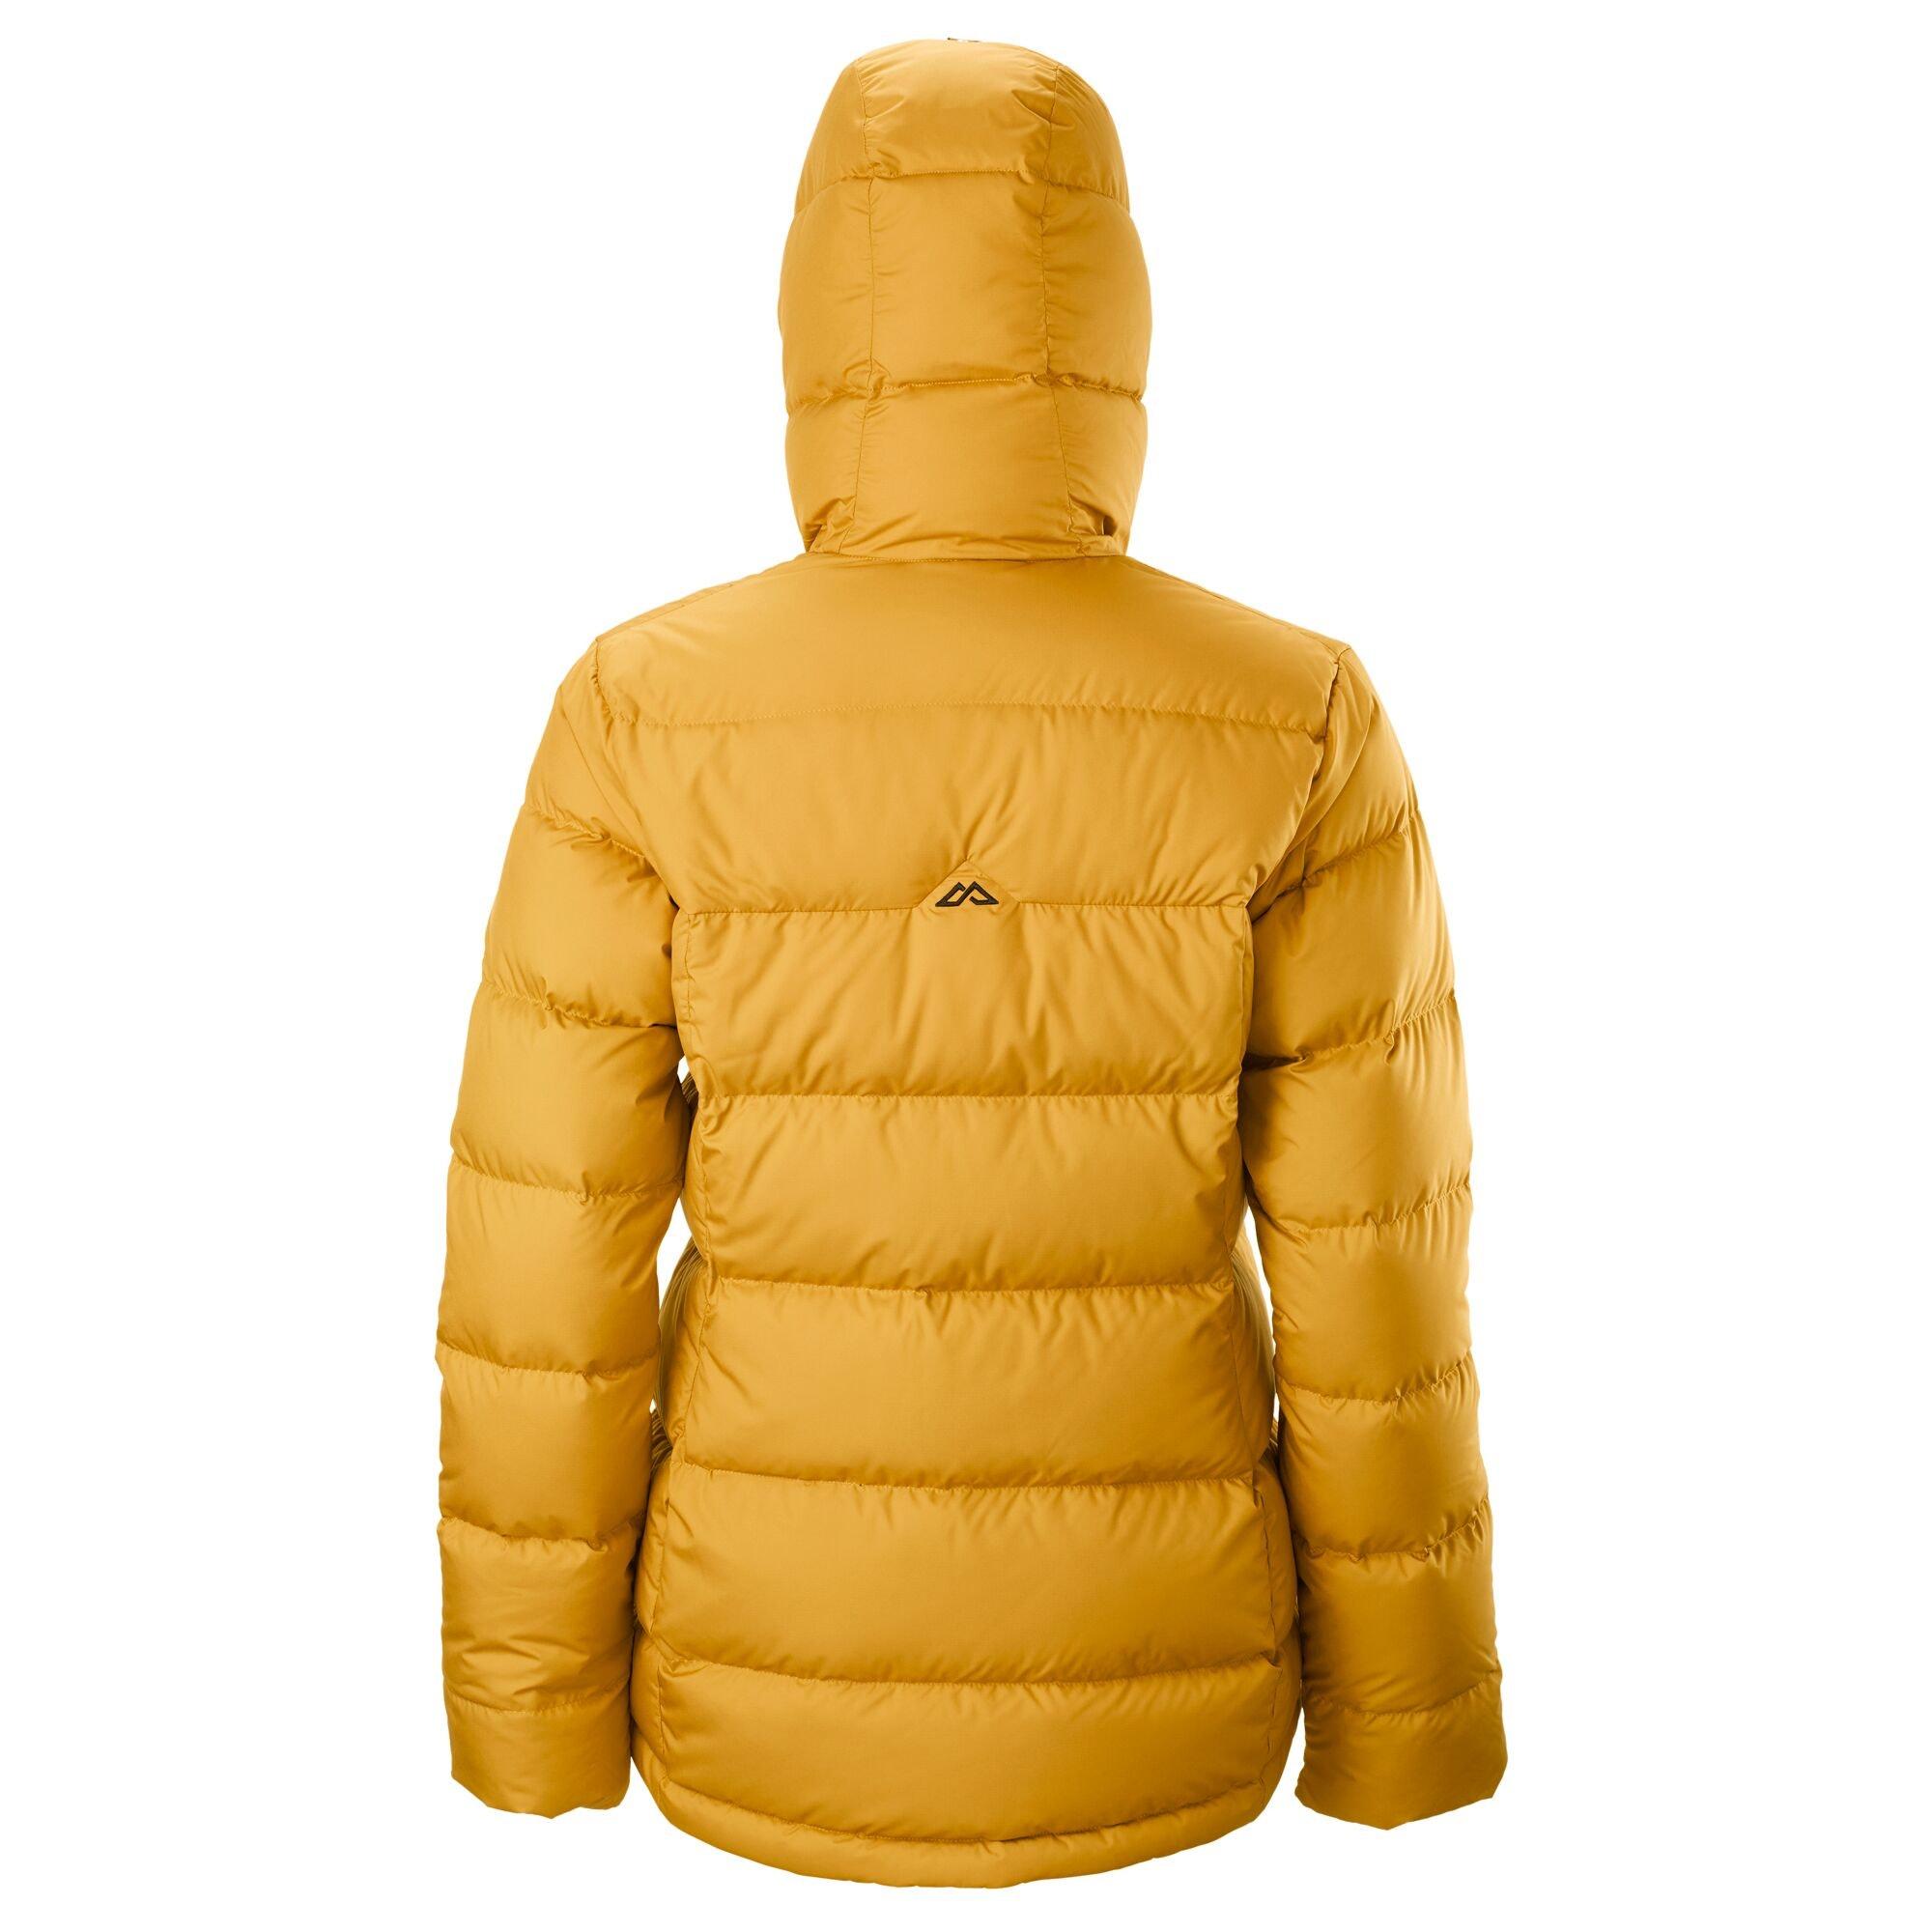 thumbnail 49 - NEW Kathmandu Epiq Womens Hooded Down Puffer 600 Fill Warm Outdoor Winter Jacket